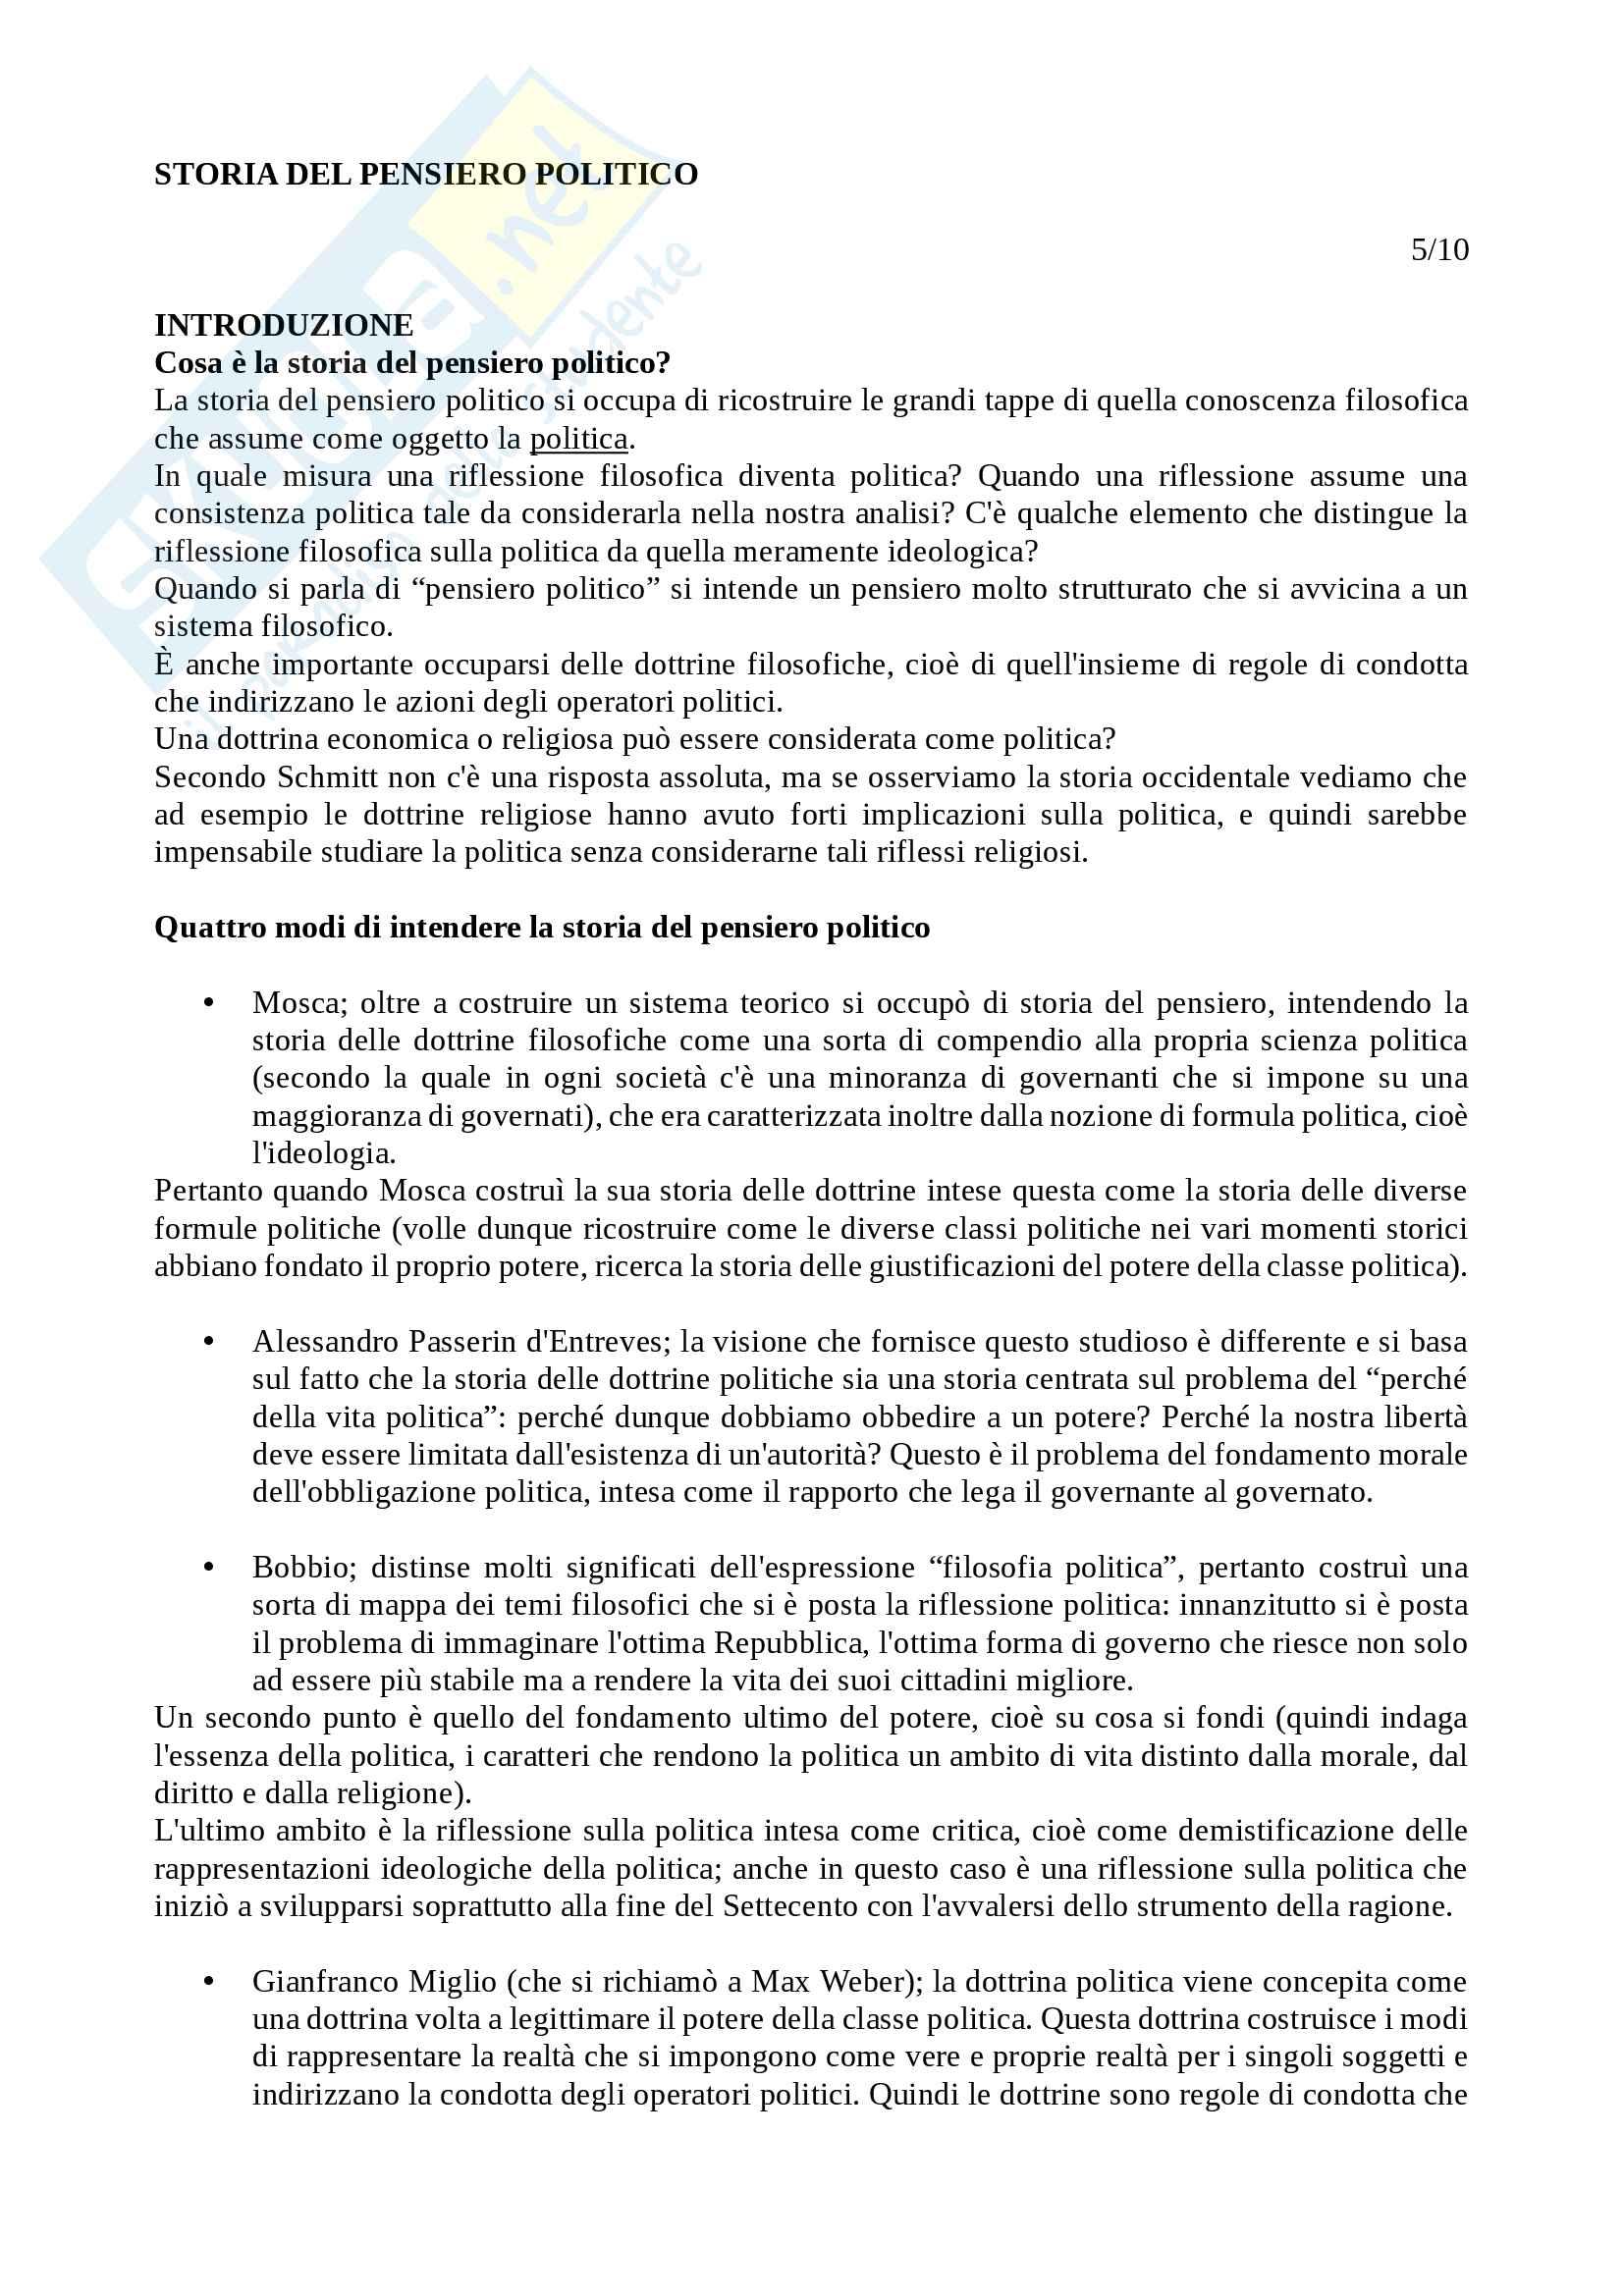 Storia del pensiero politico -  prof. Cotellessa